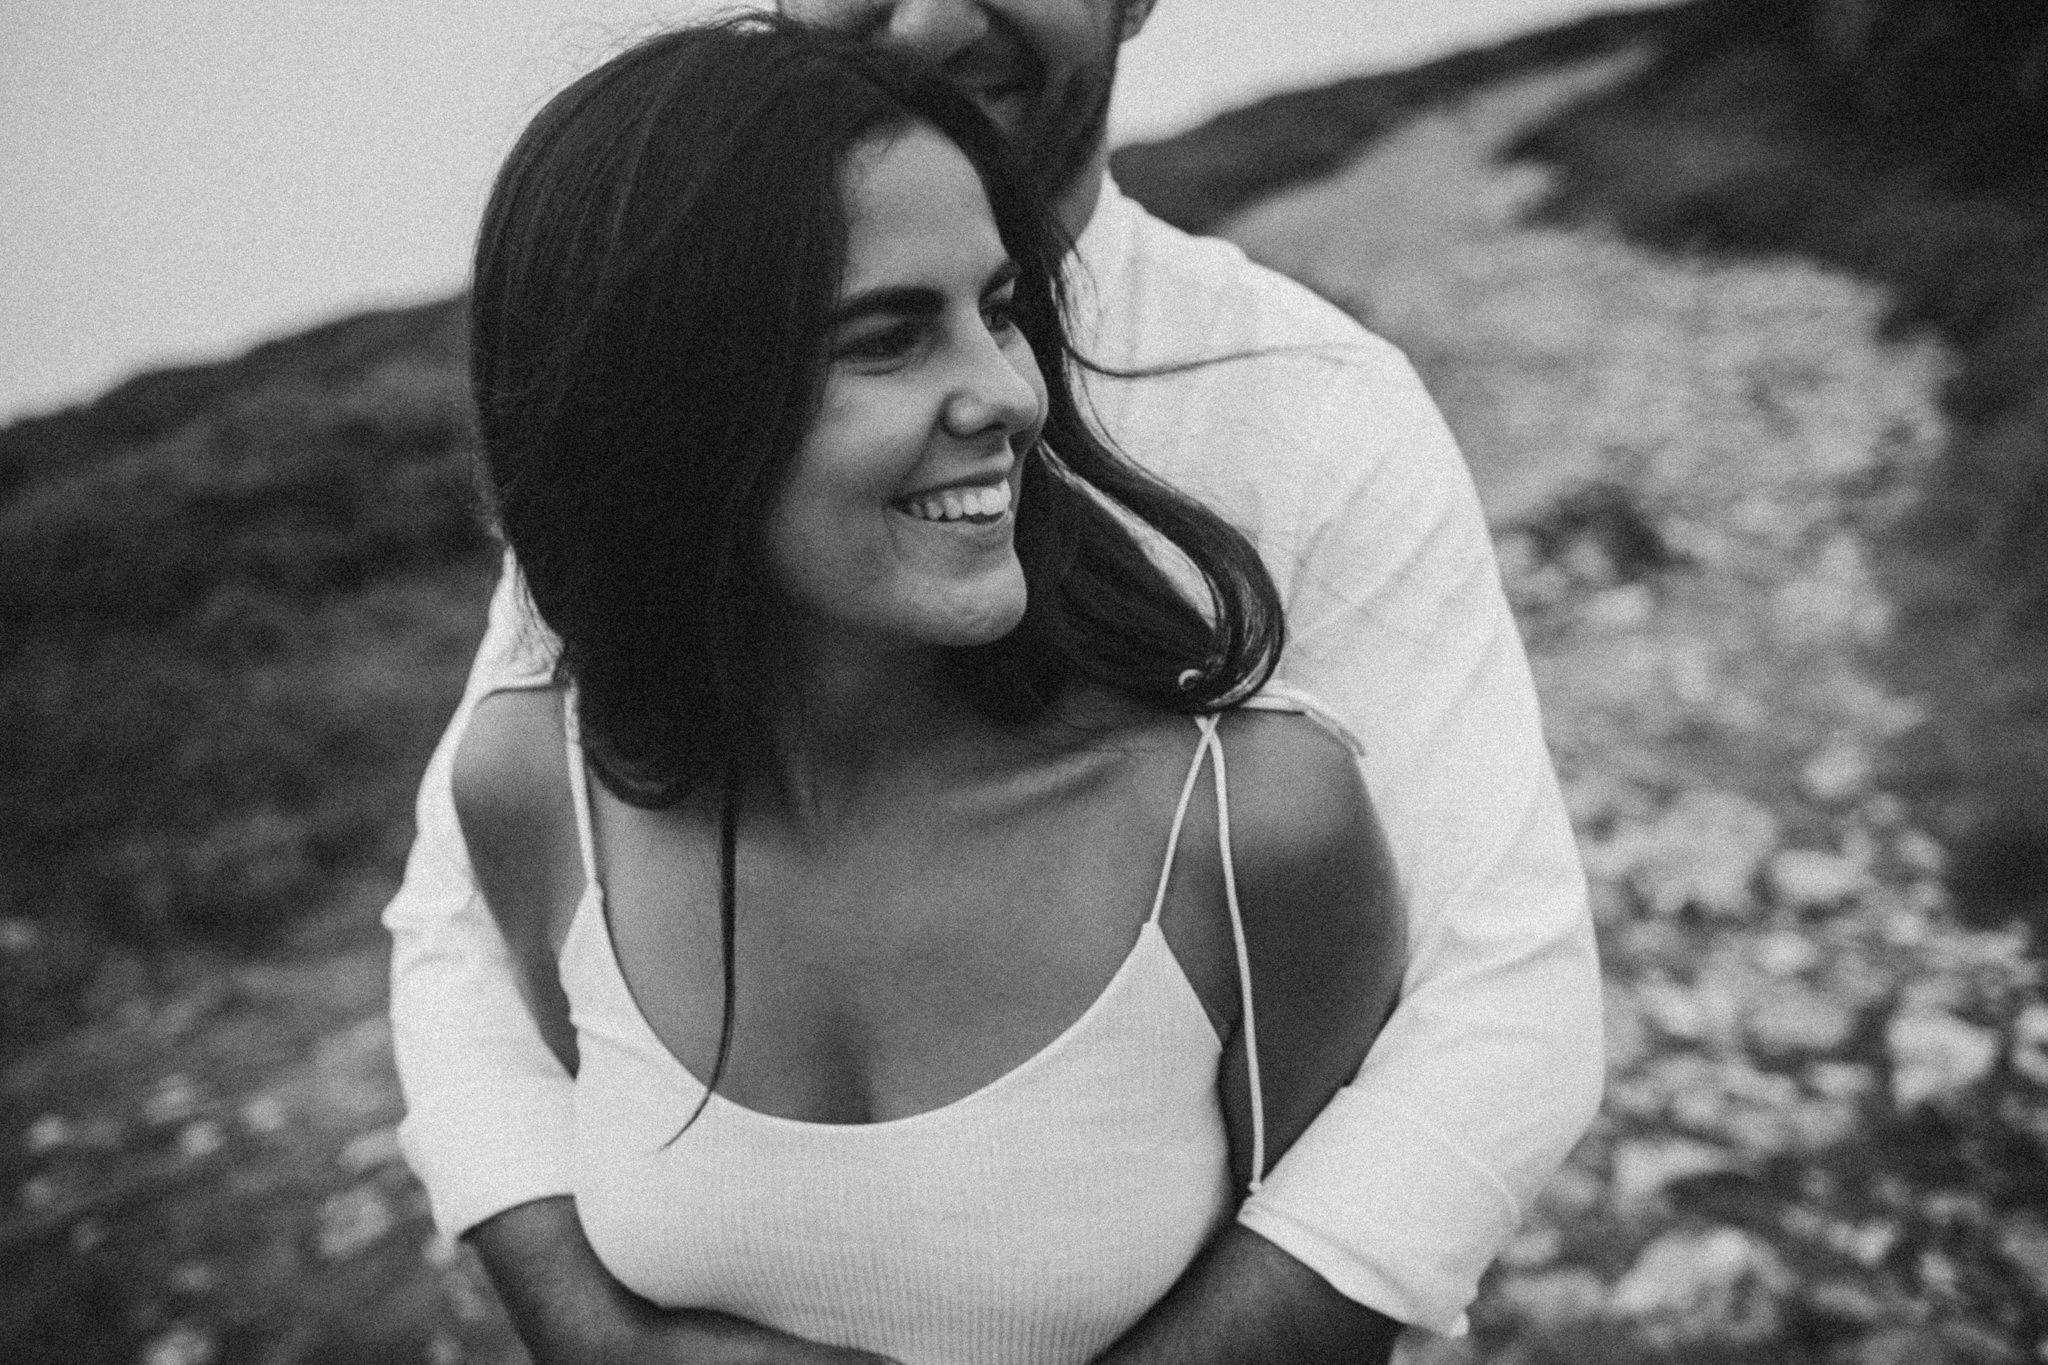 Man hugges his girlfriend